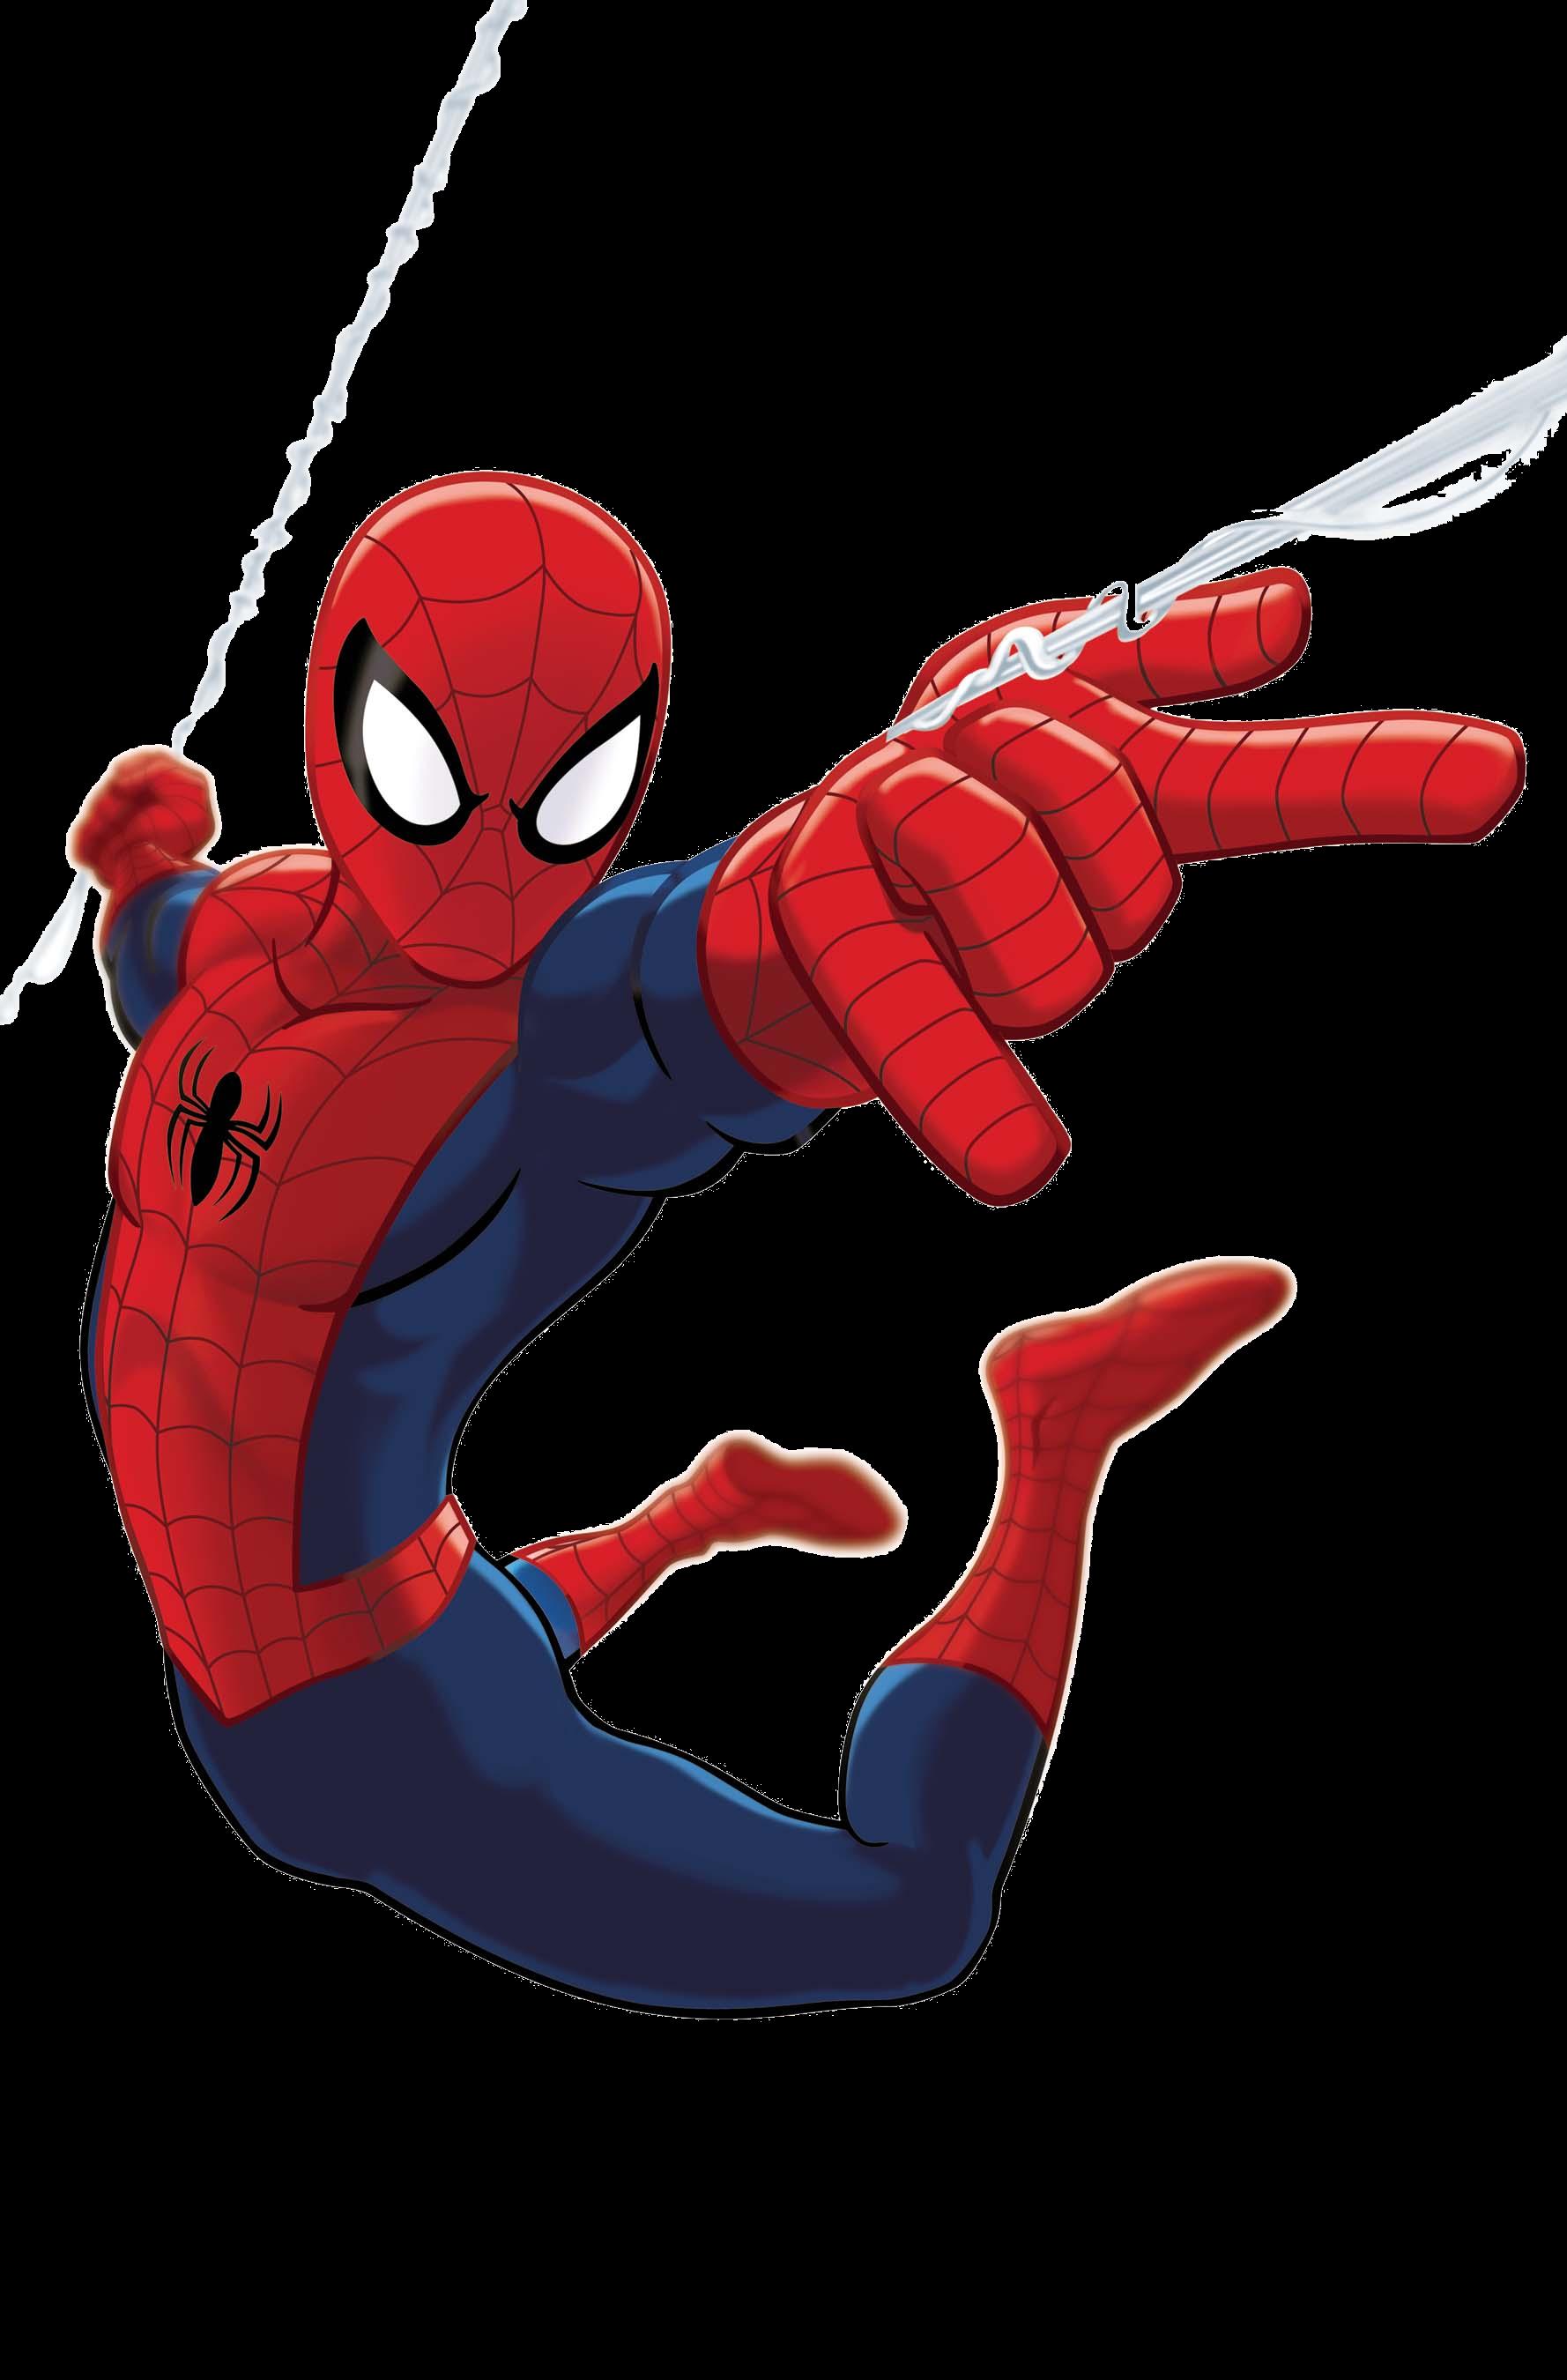 Hand clipart spiderman. Spider man pinterest and